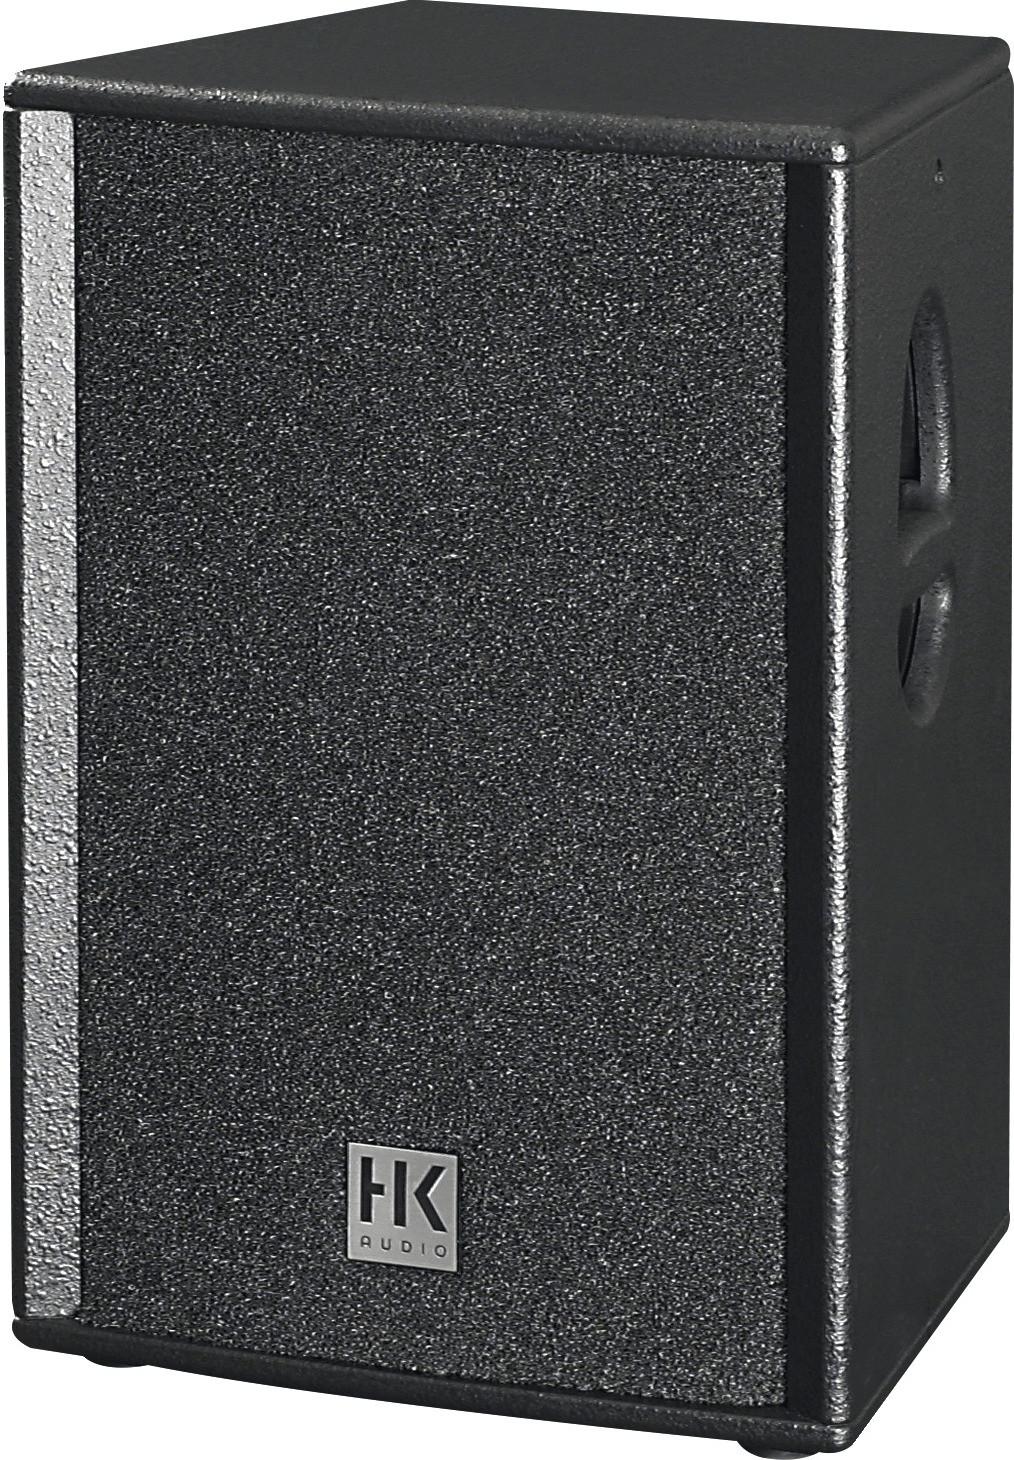 Image of HK Audio PR:O 12